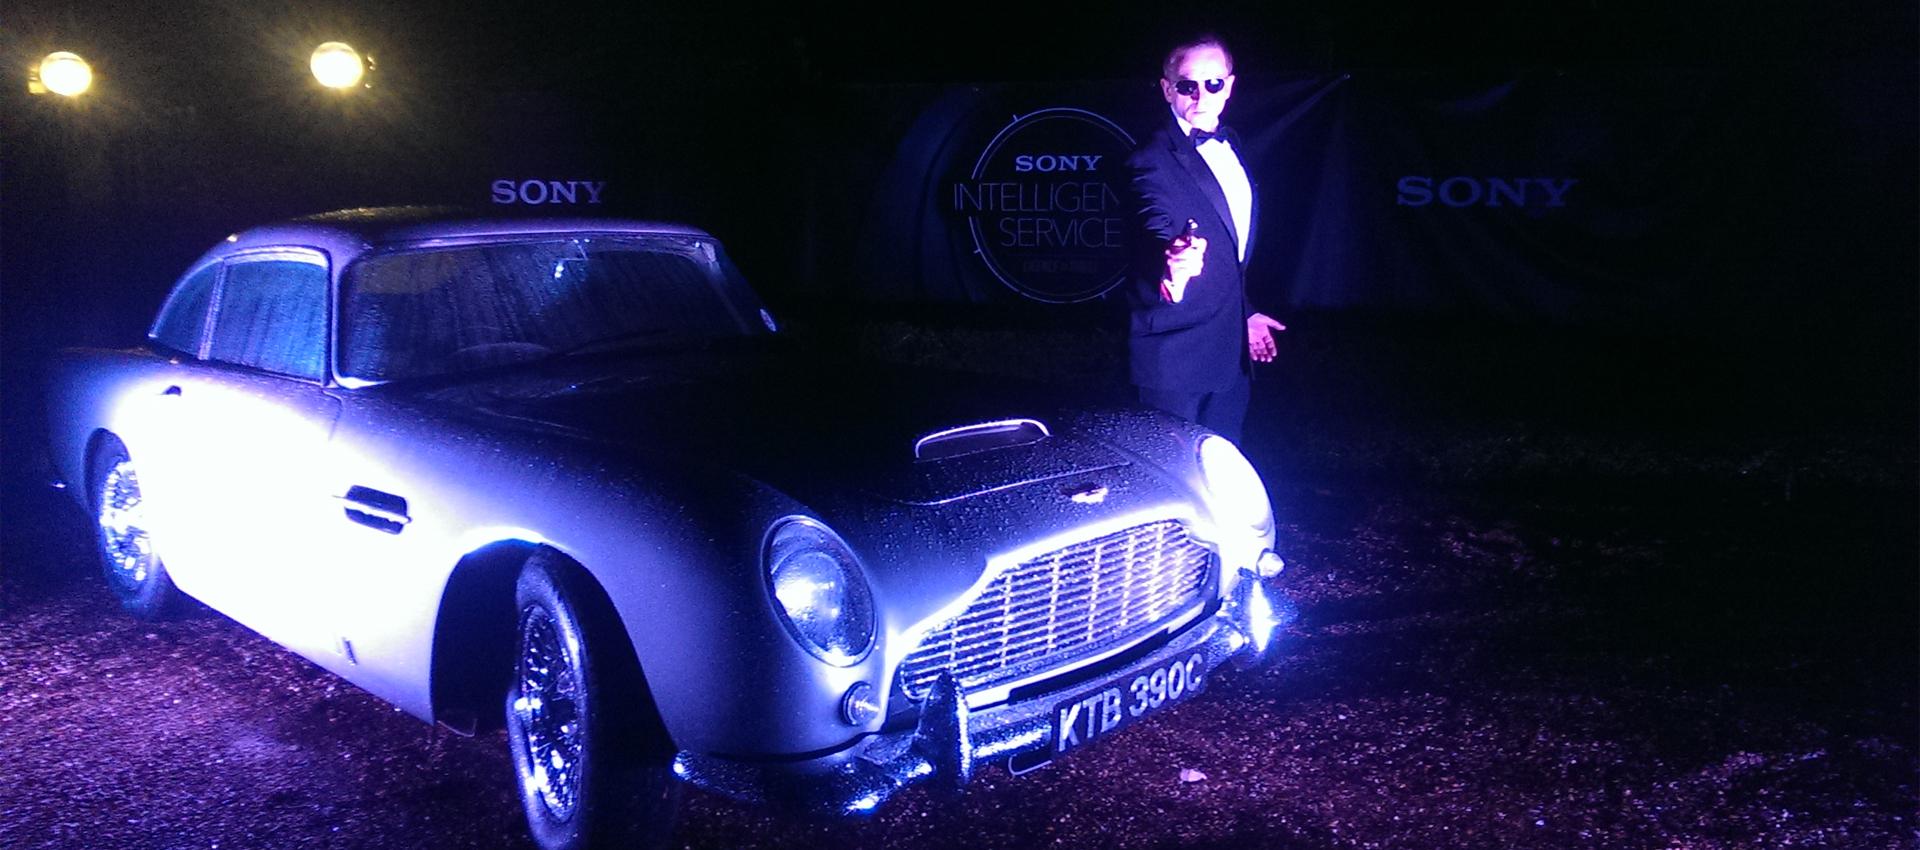 aston martin db5 hire - the ultimate james bond car